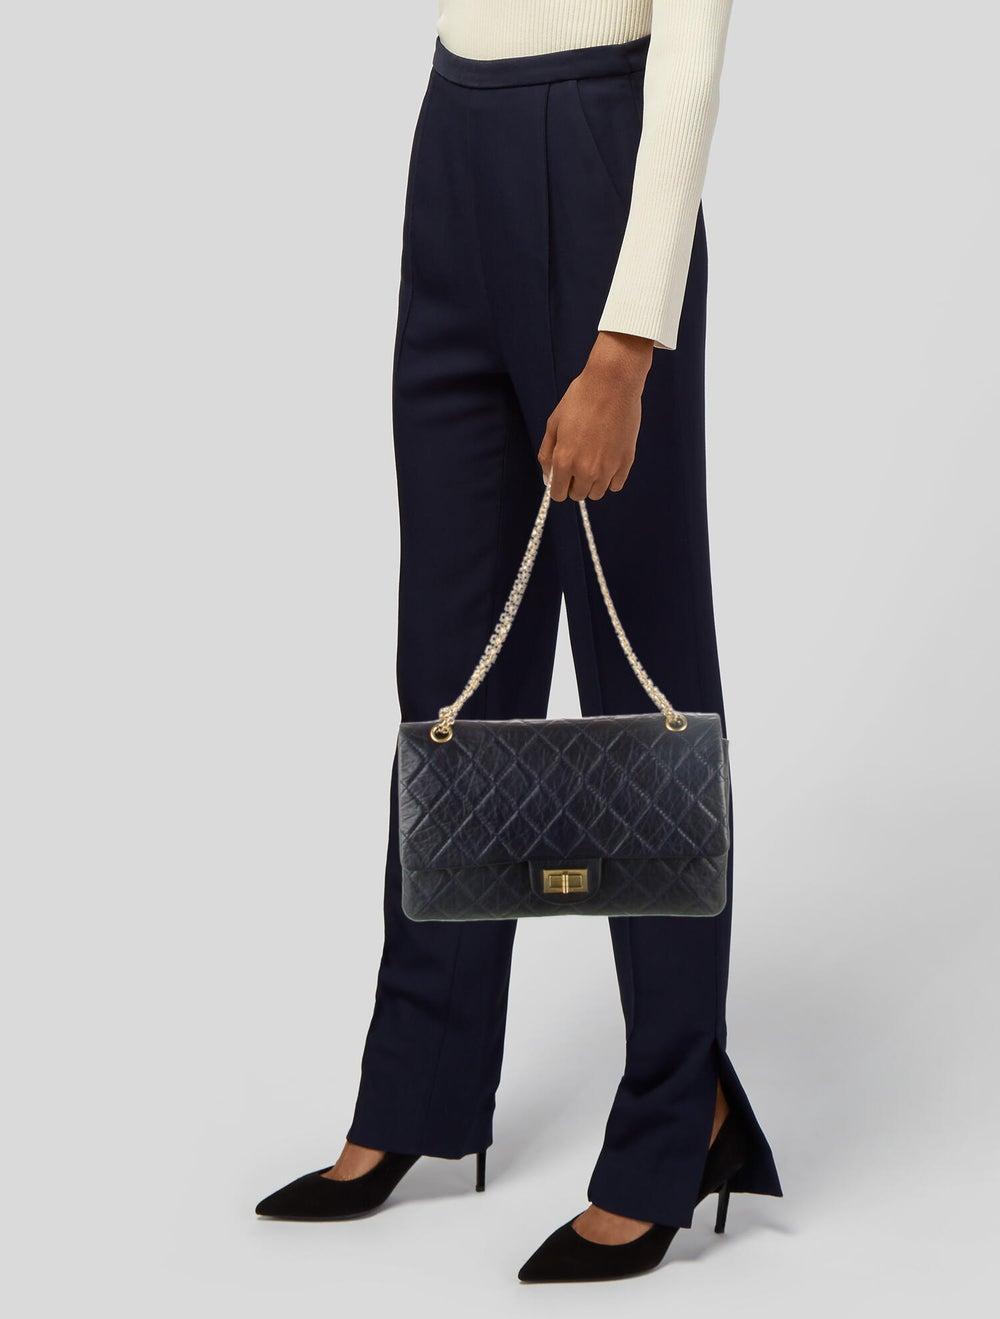 Chanel Reissue 227 Double Flap Bag Blue - image 2